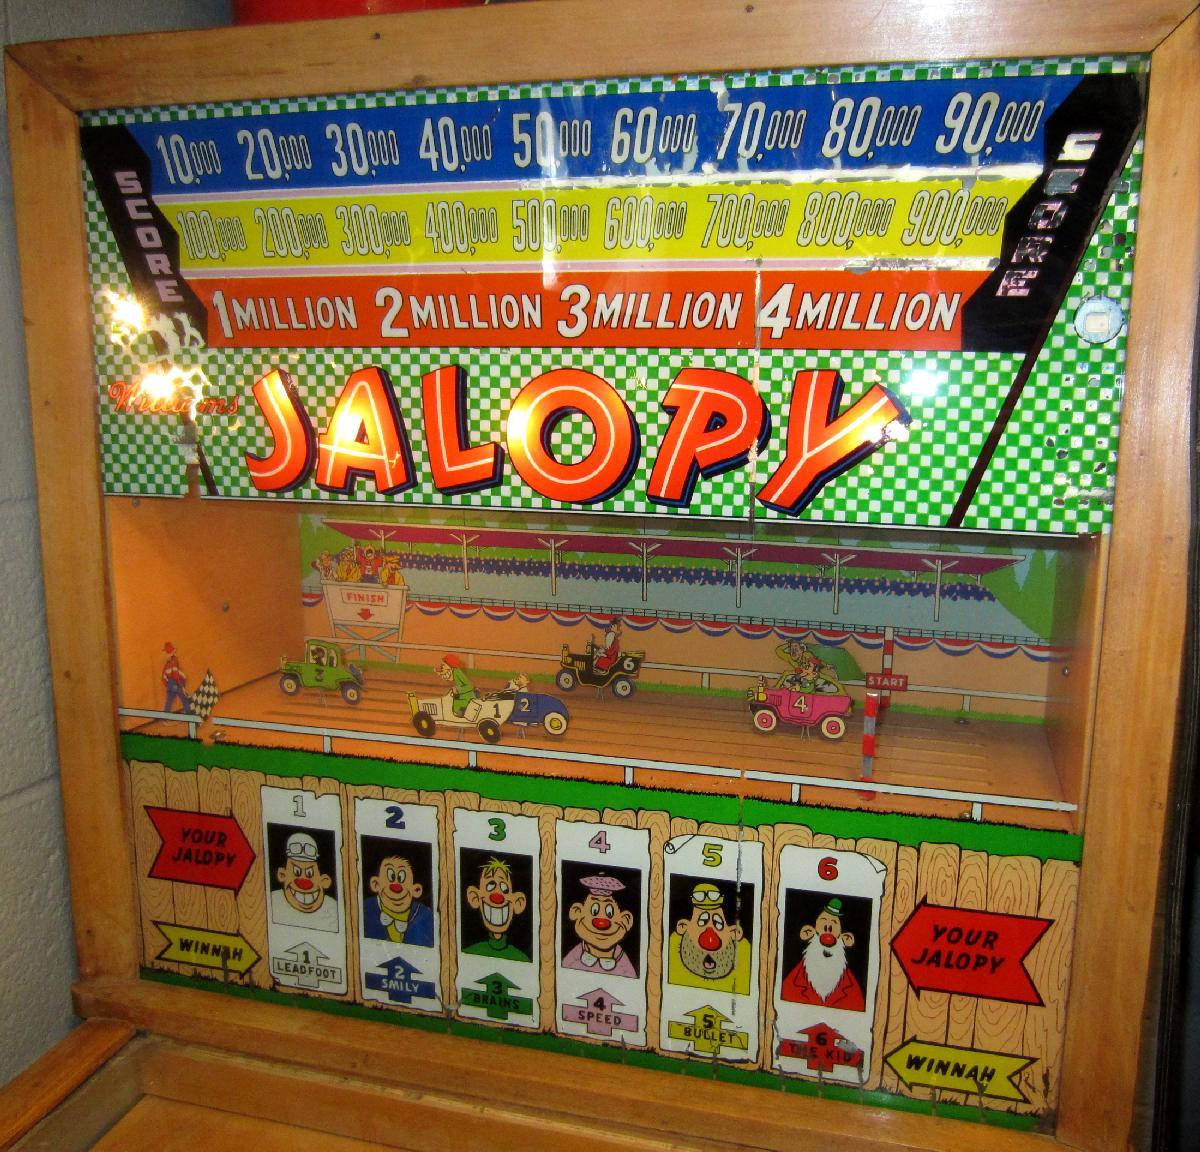 Vintage Arcade Games >> Williams Jalopy pinball 1951 coin operated pinball arcade game